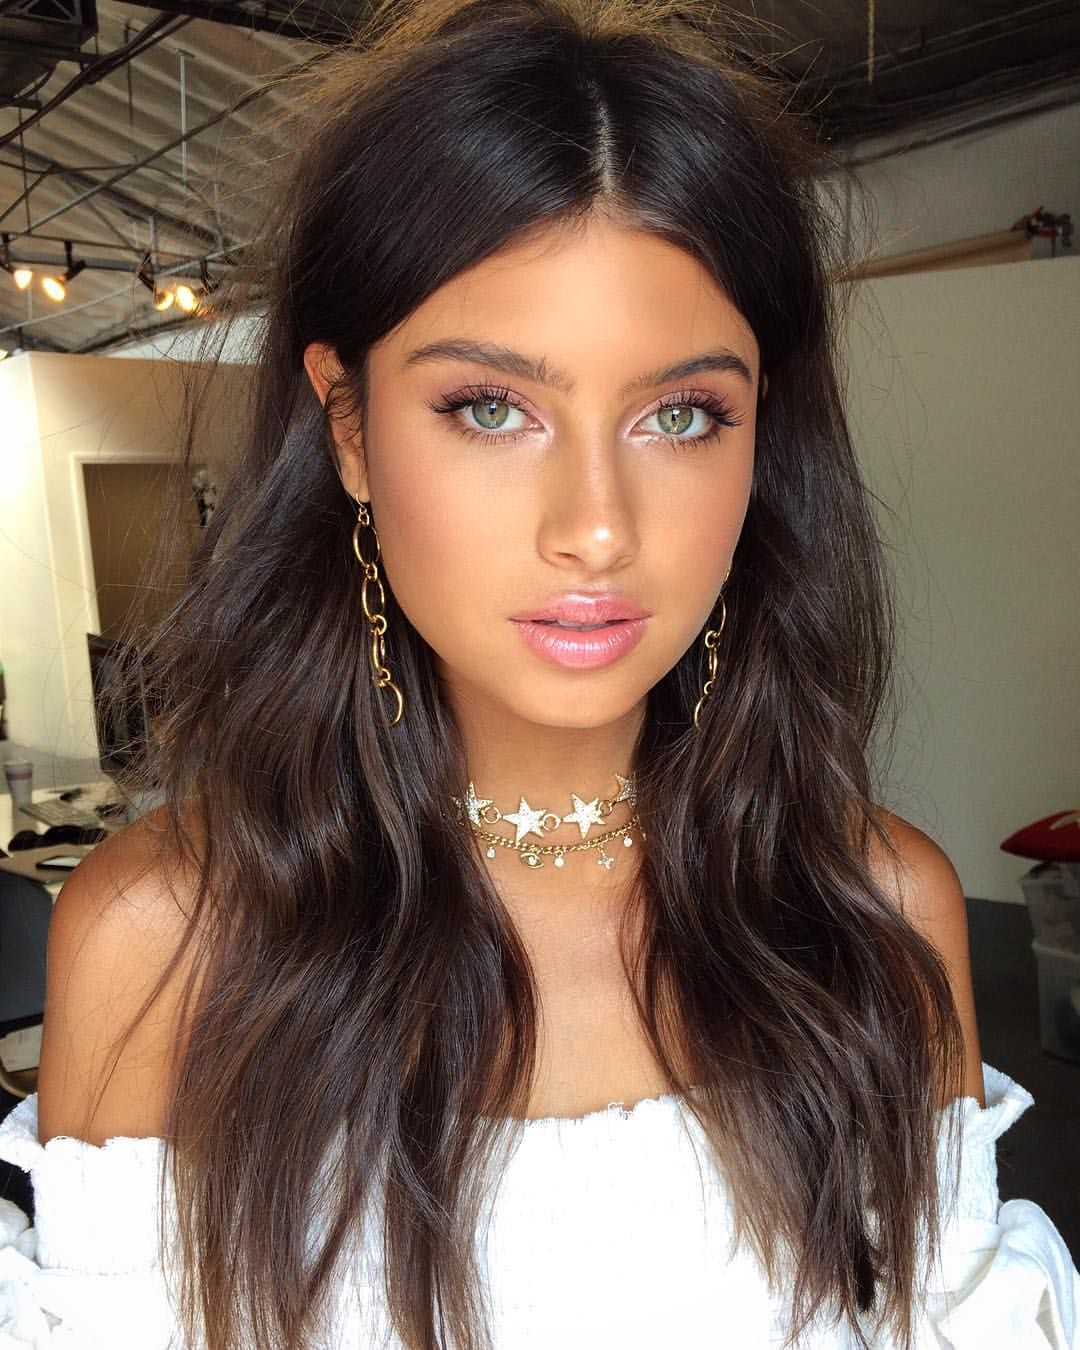 Pin By Maddie P On Makeup In 2019 Hair Hair Makeup Makeup